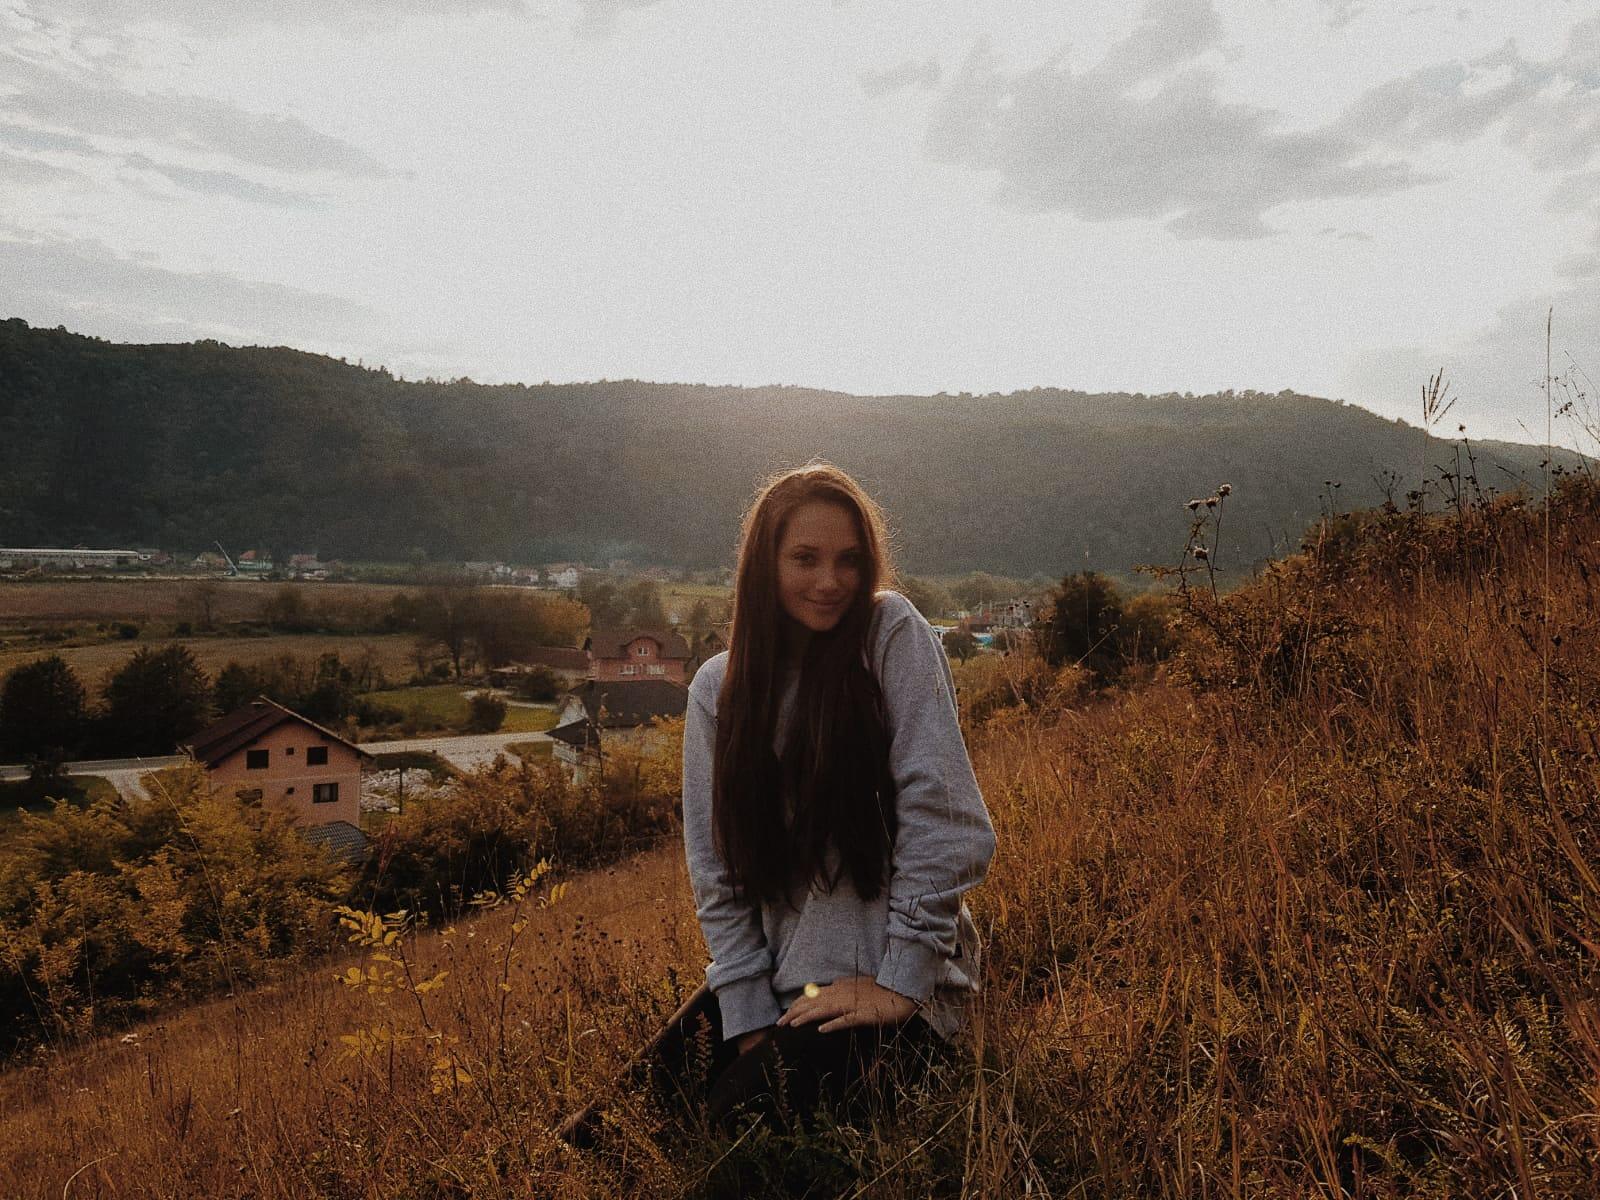 Sana kroz fotografije Džejle Halilagić